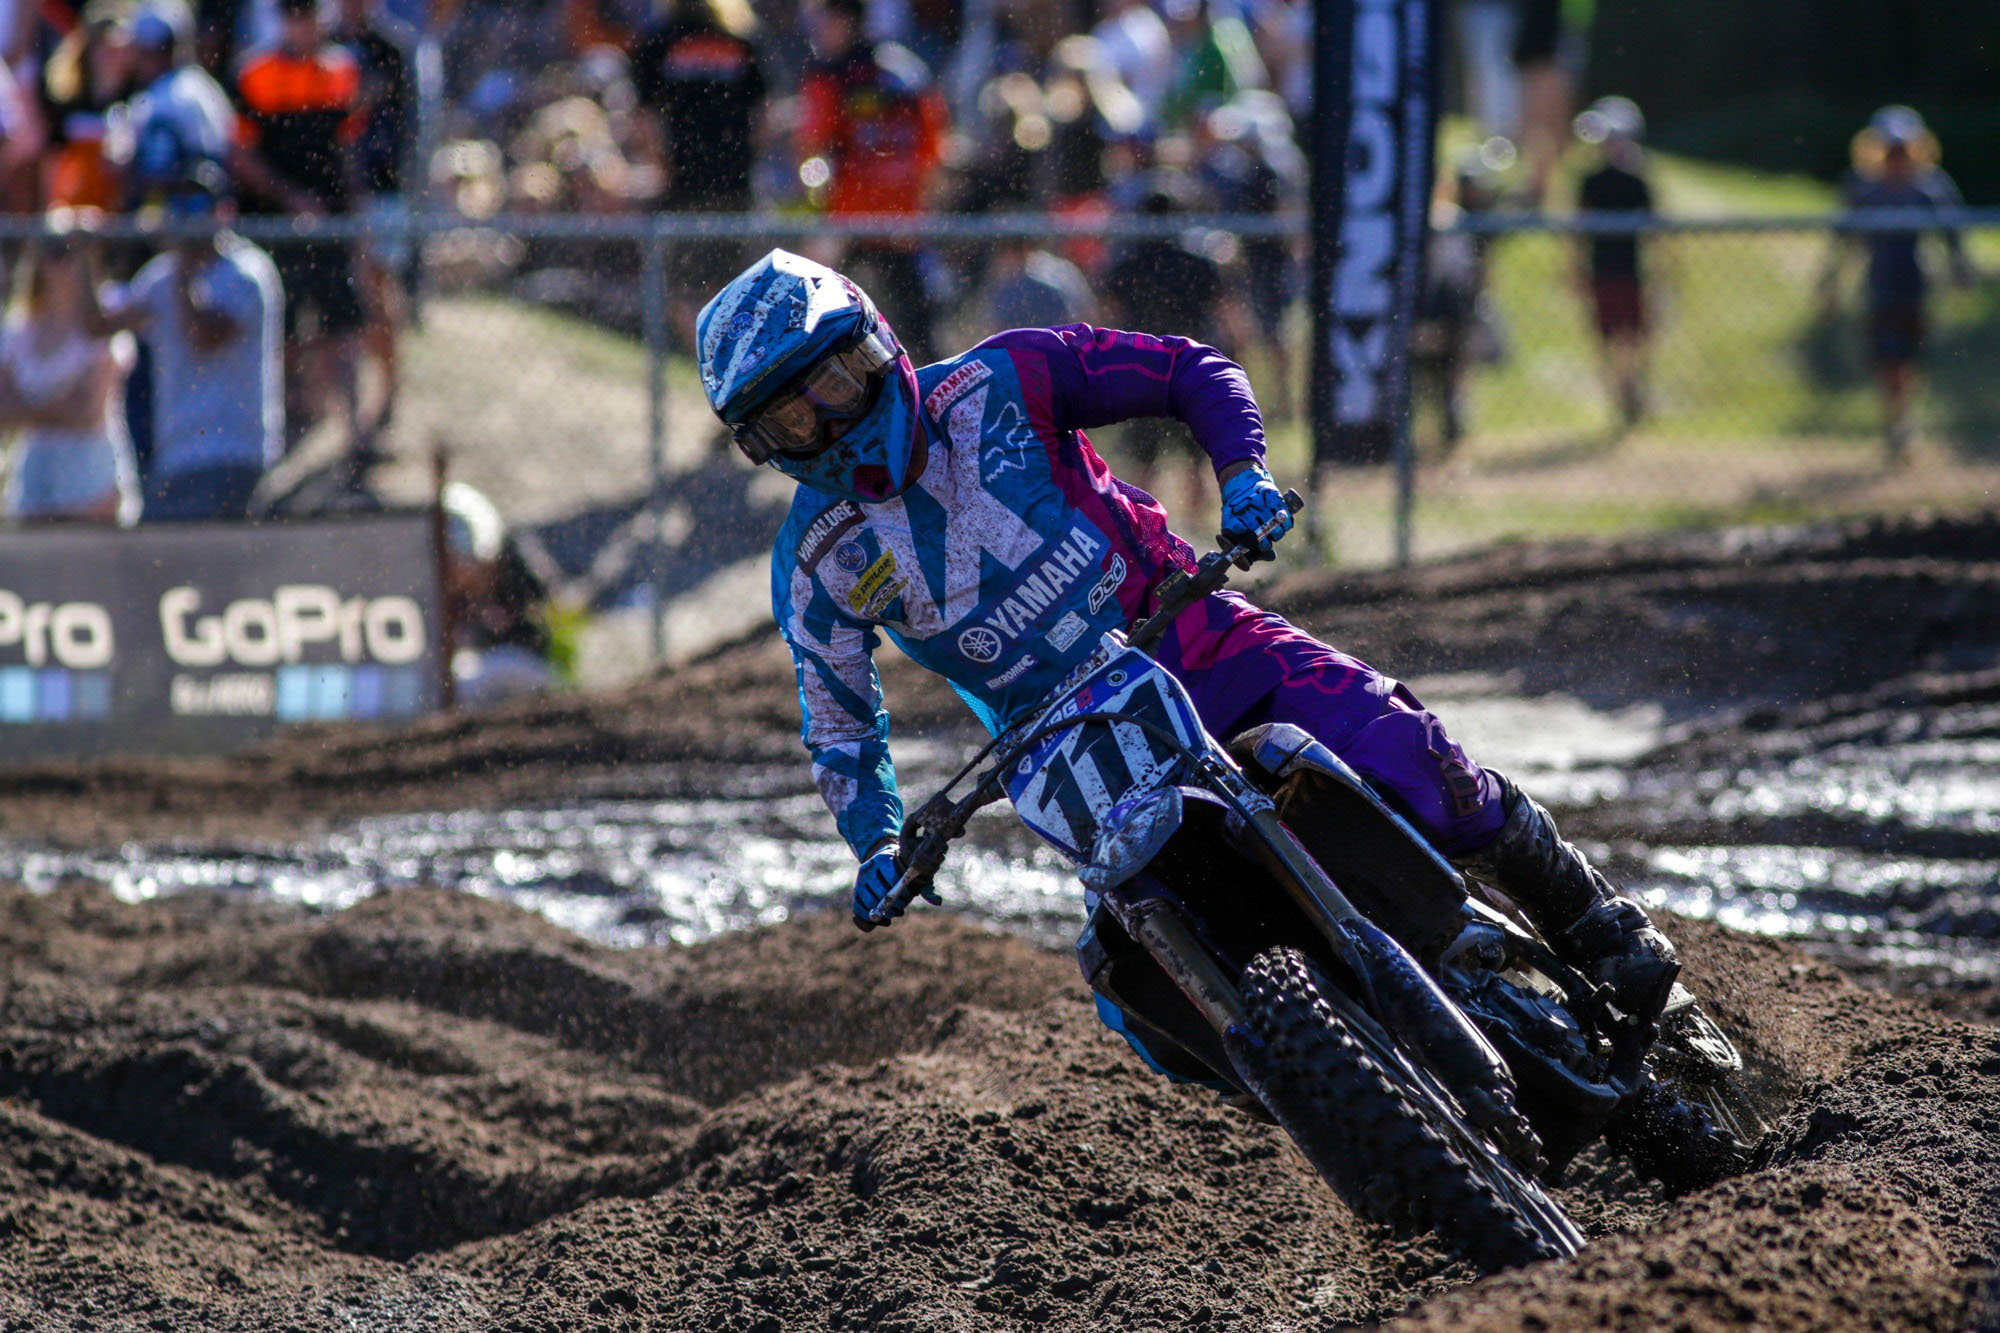 Cdr Yamaha S Dean Ferris Wins Mx Nationals Bike Review